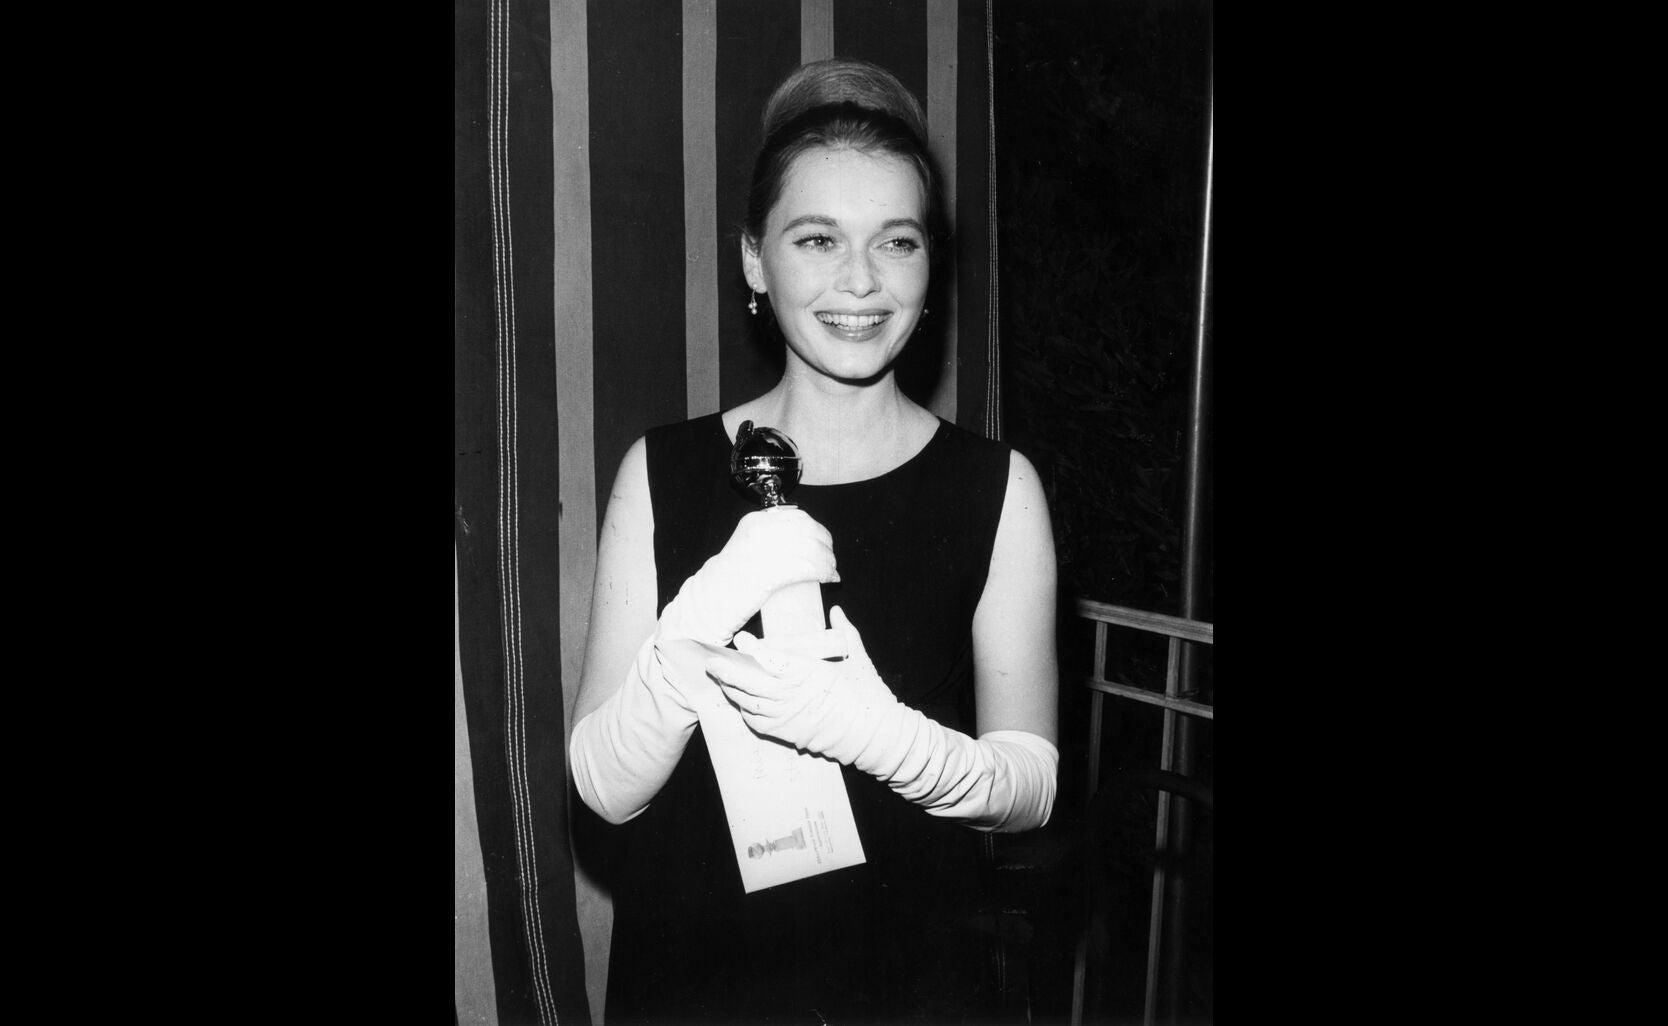 Mia Farrow, Most Promising Actress, Golden Globes 1965